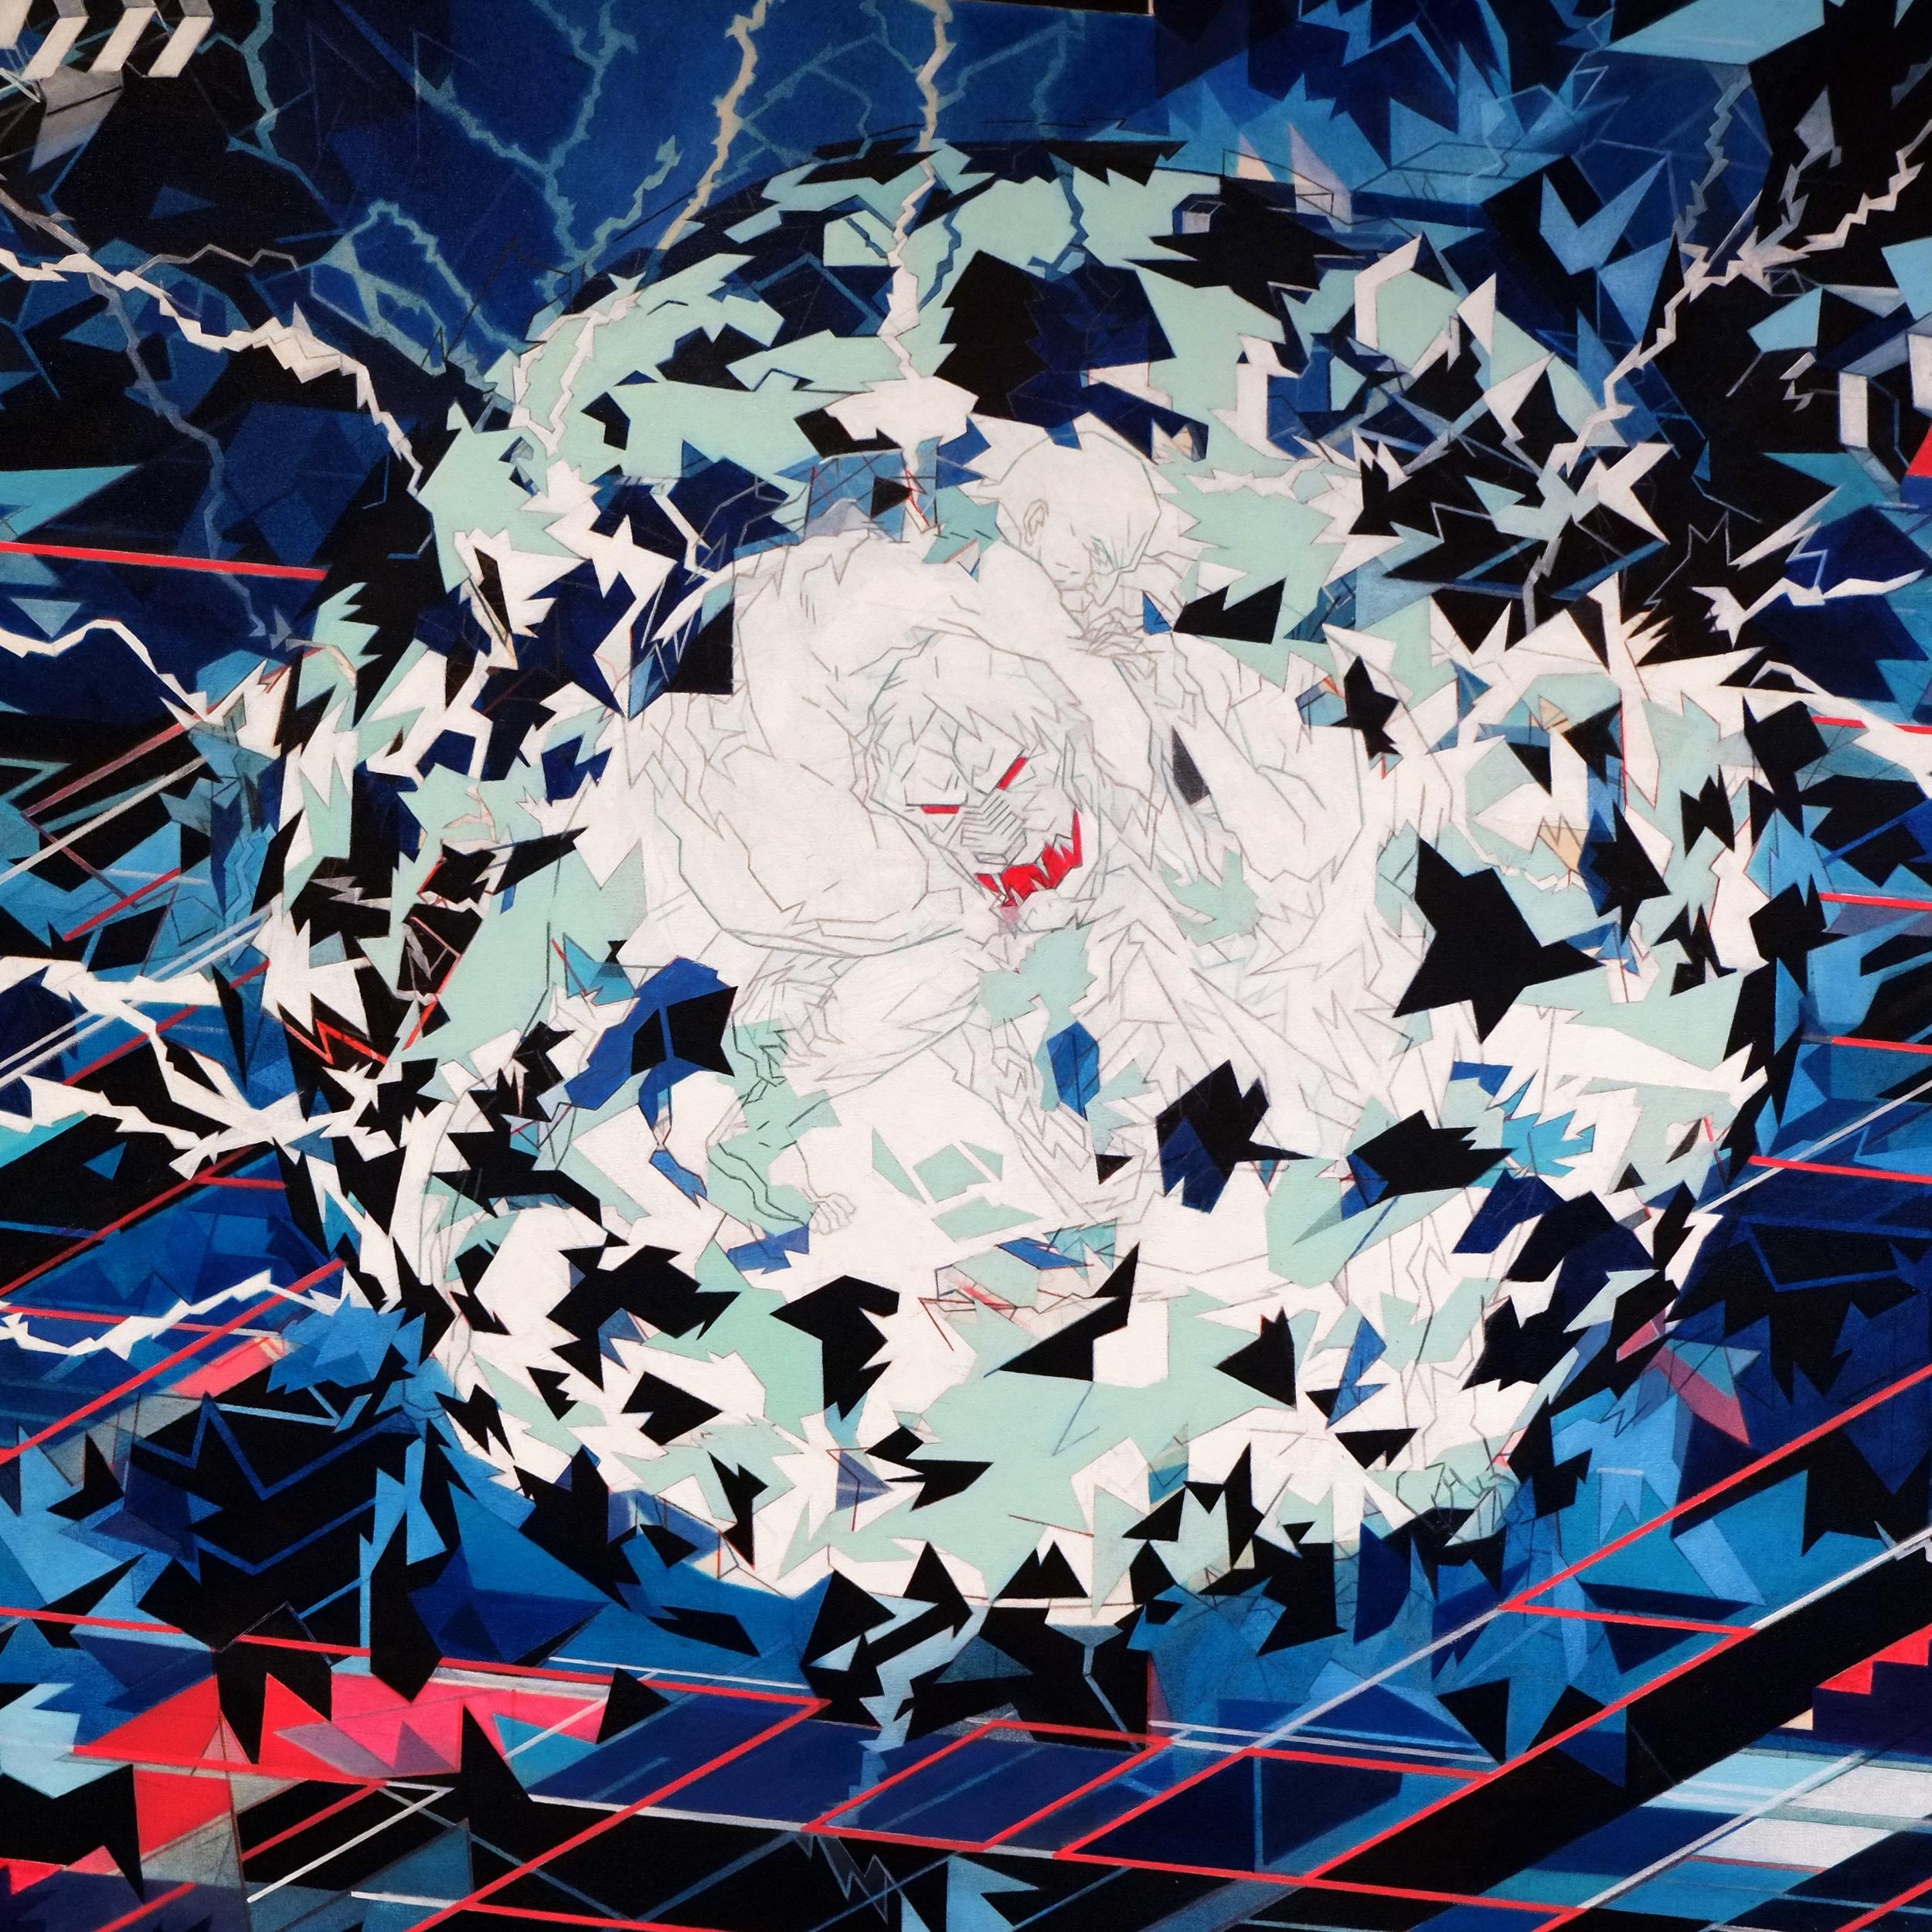 Jon Fox - Prisoners Cinema - oil on canvas - 250x150cm (detail)